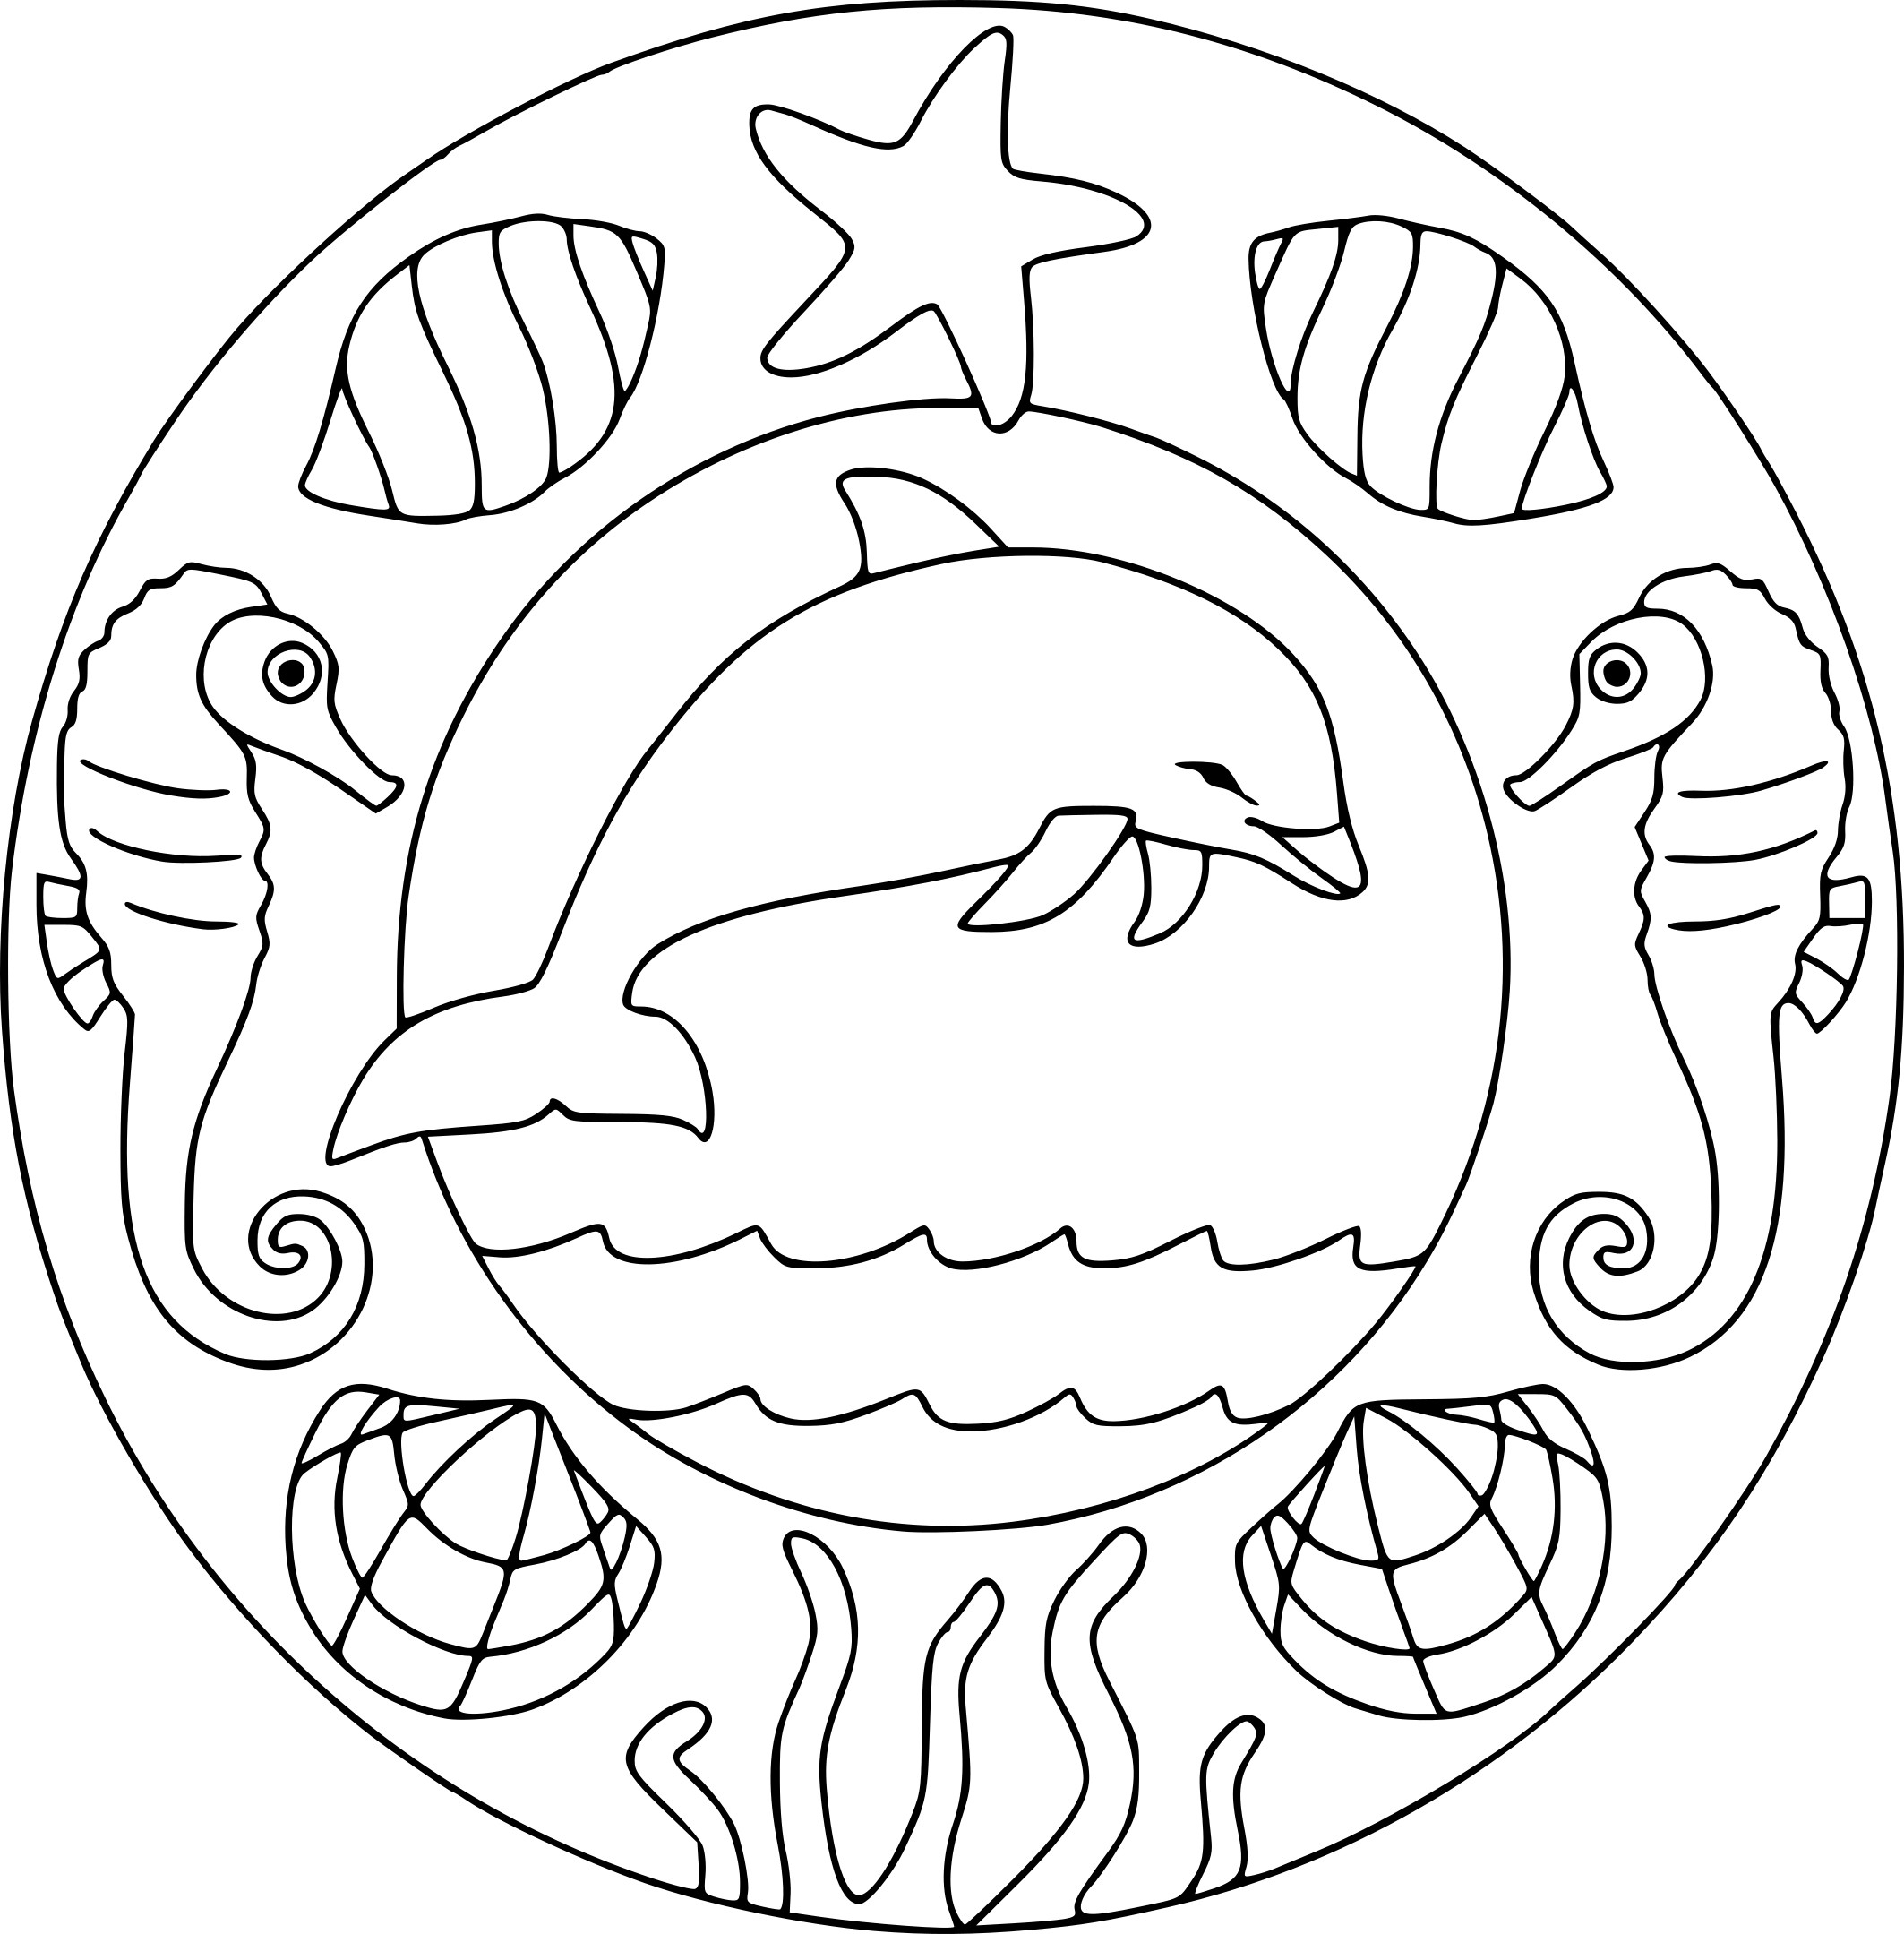 Coloriage Dauphin Mandala Dessin À Imprimer Sur Coloriages concernant Dessin Dauphin À Imprimer